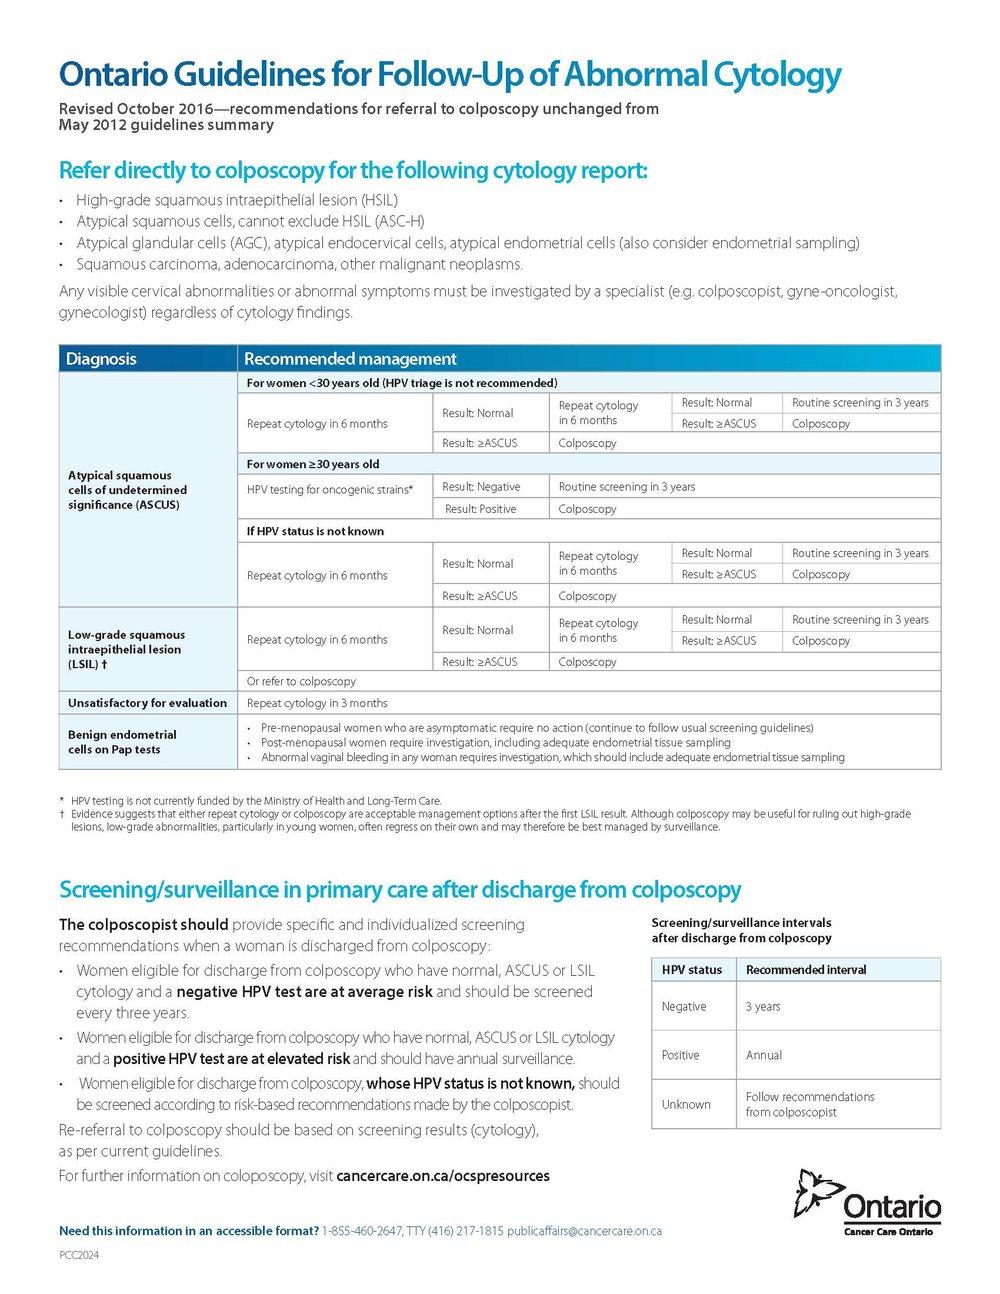 CervicalScreeningGuidelines_Page_1.jpg